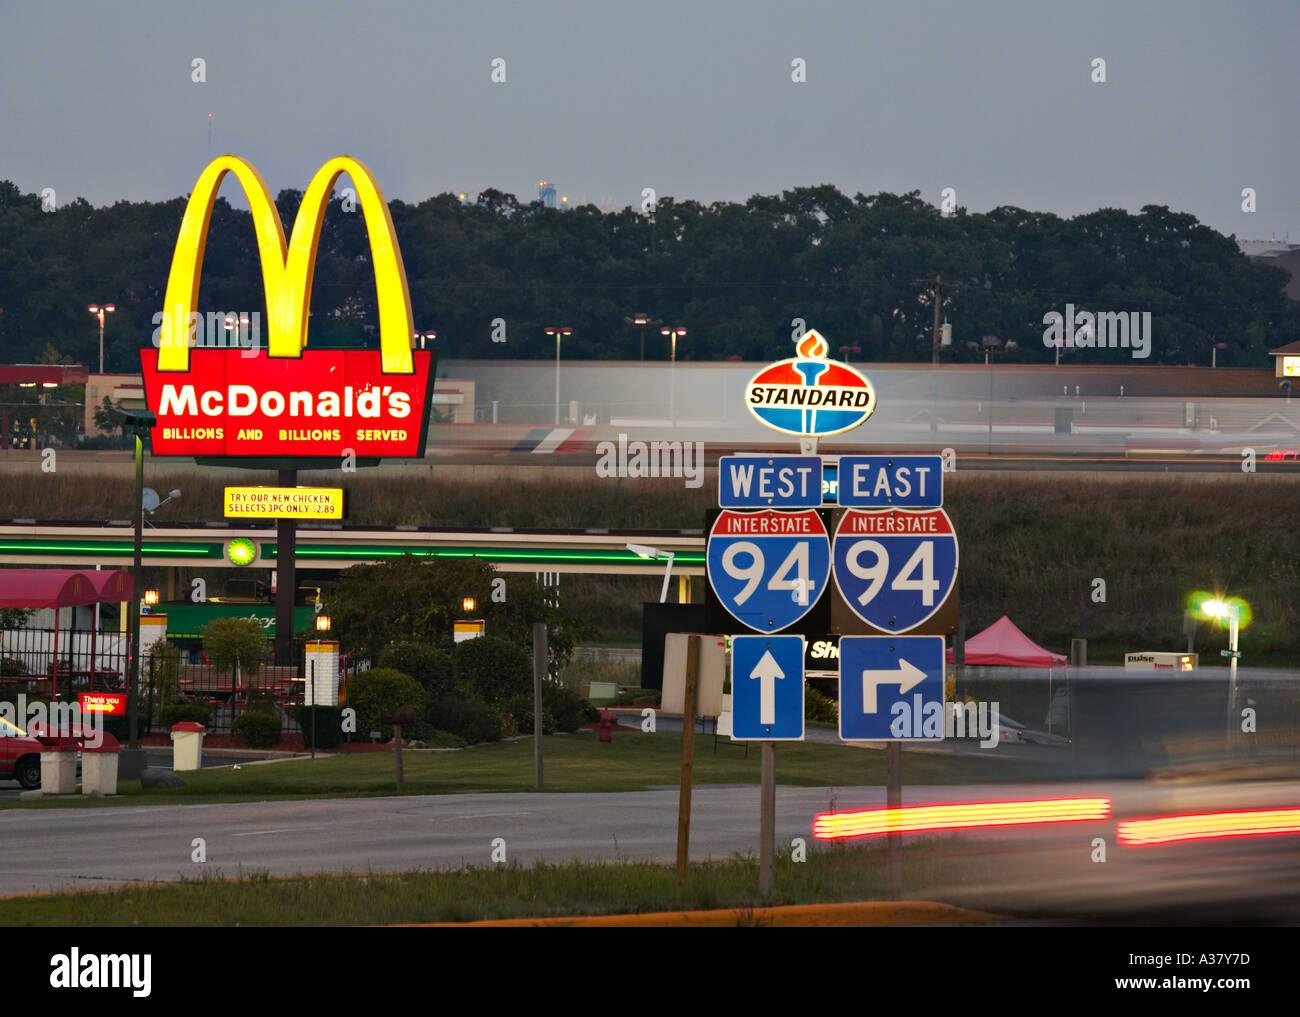 Wisconsin Kenosha Fast Food Restaurants Near Interstate Highway